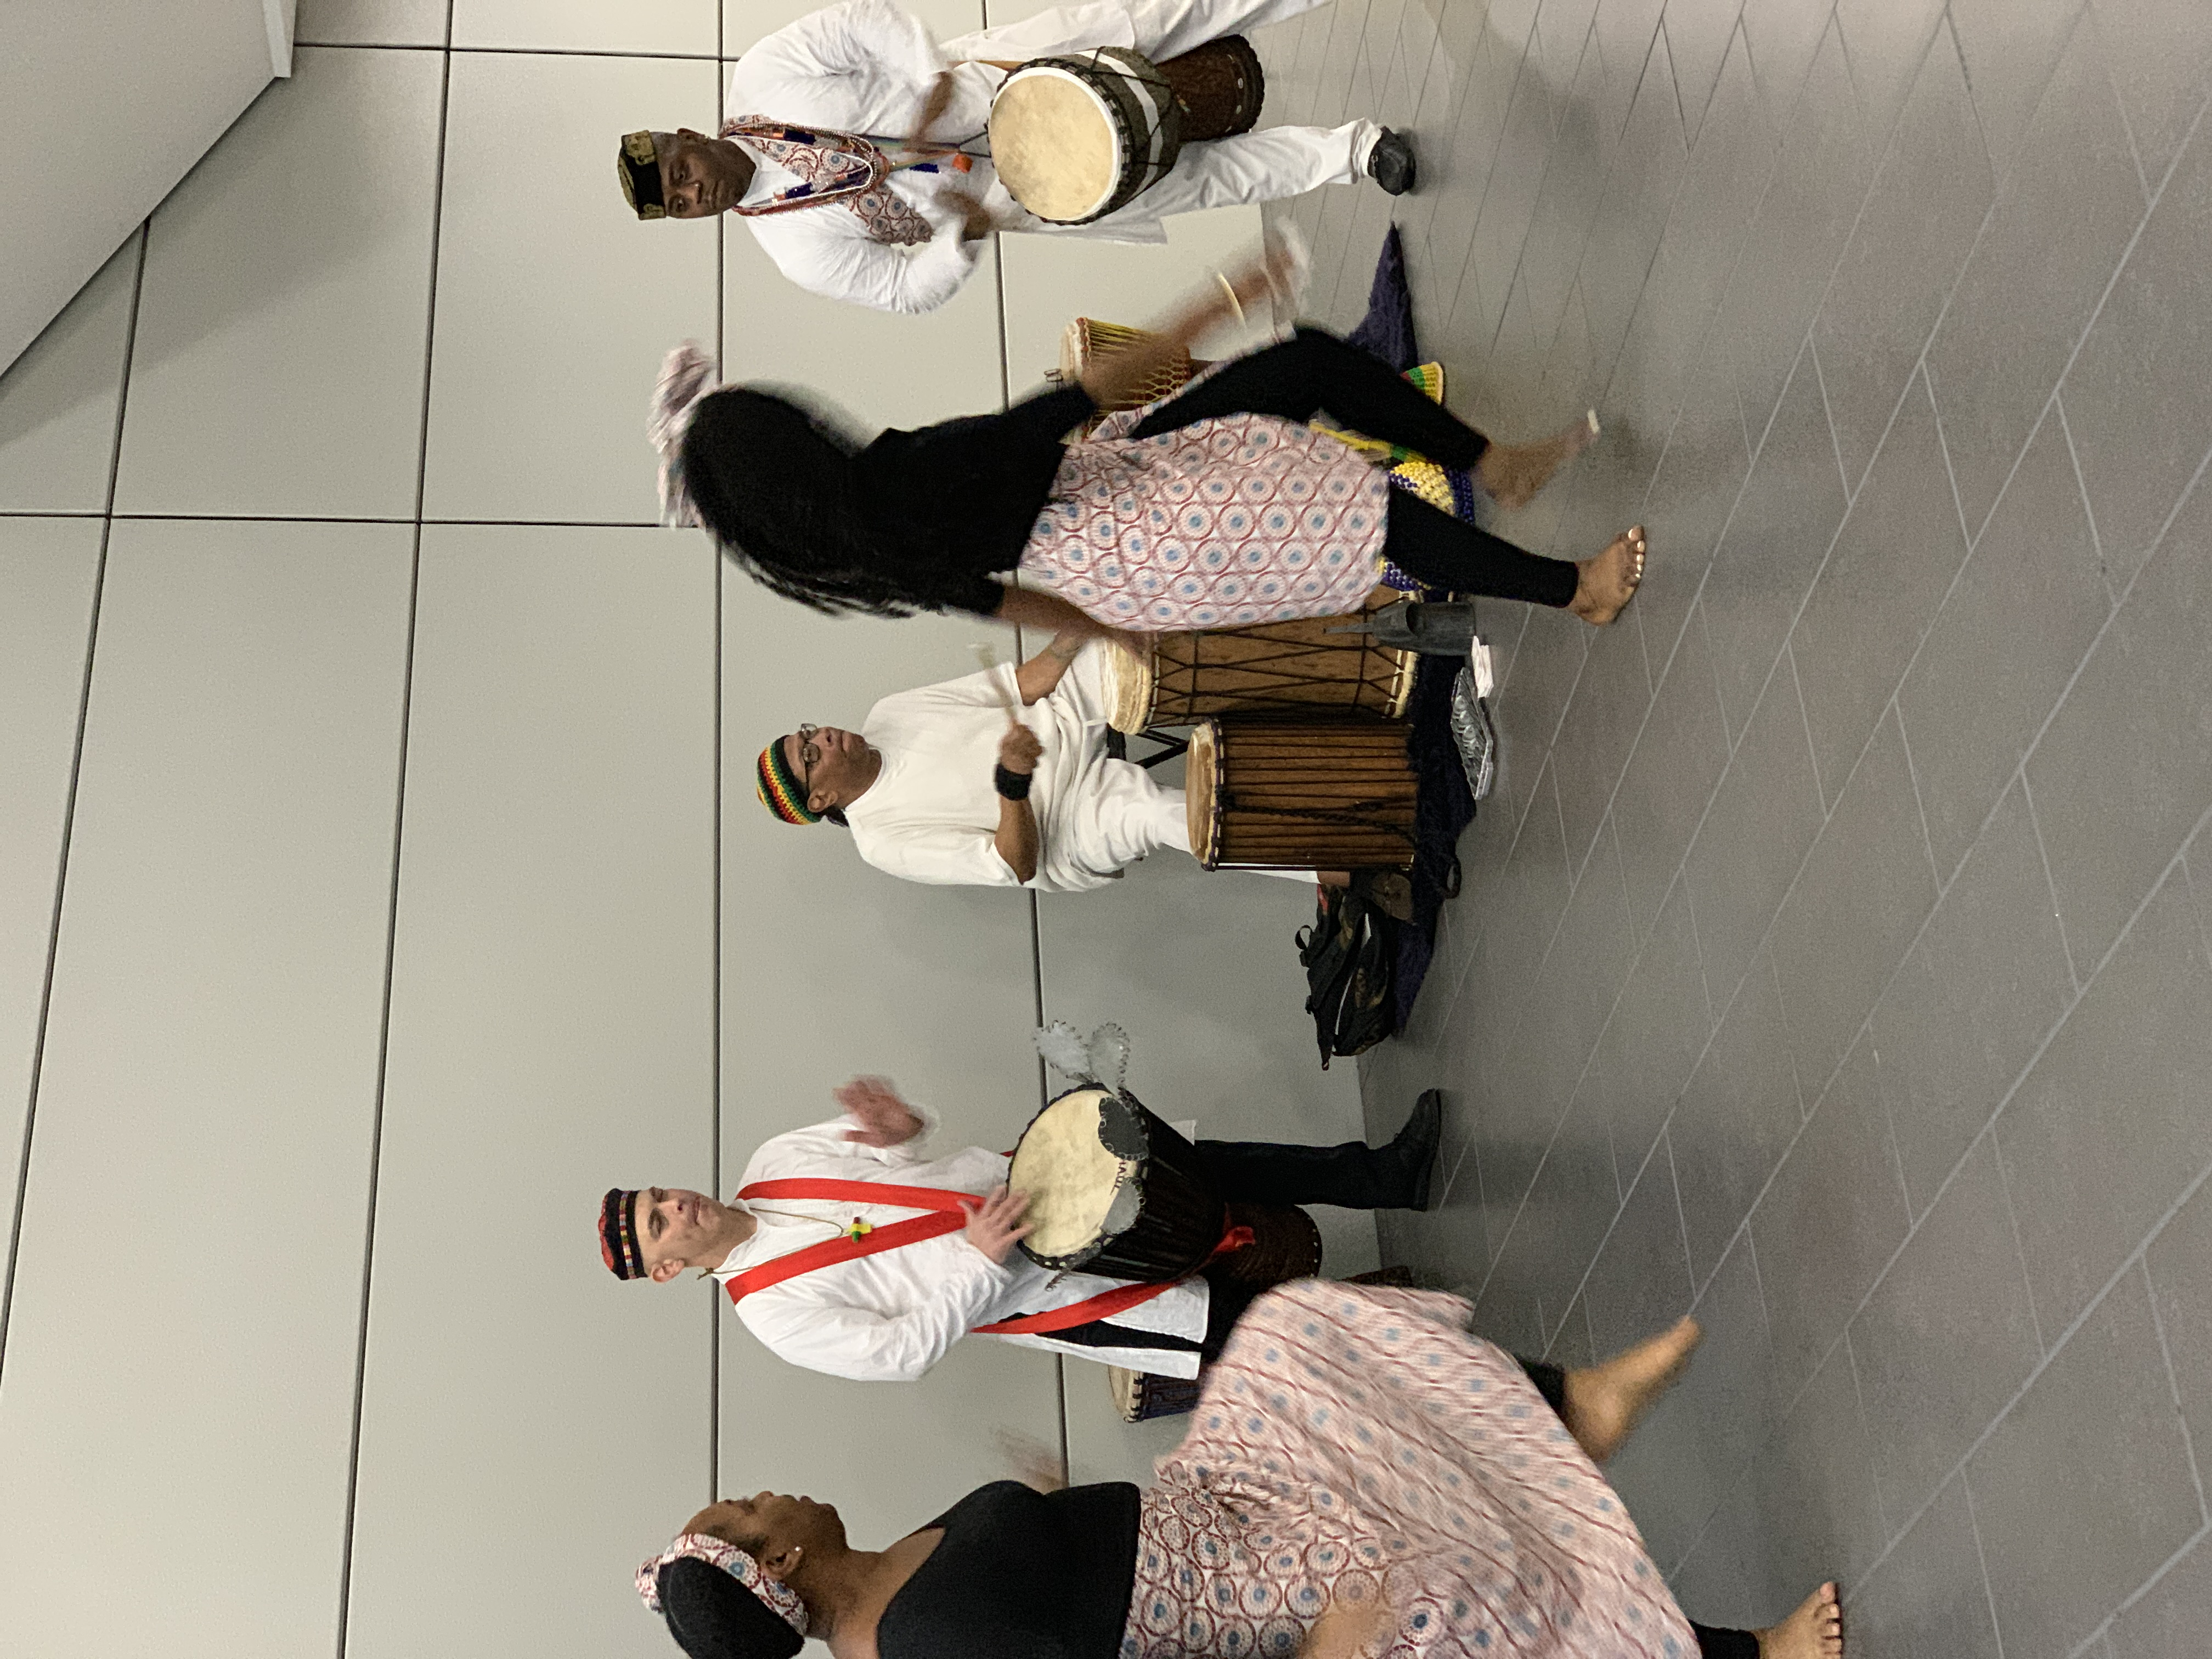 Lewa Afriika drum and dance performance at University Park